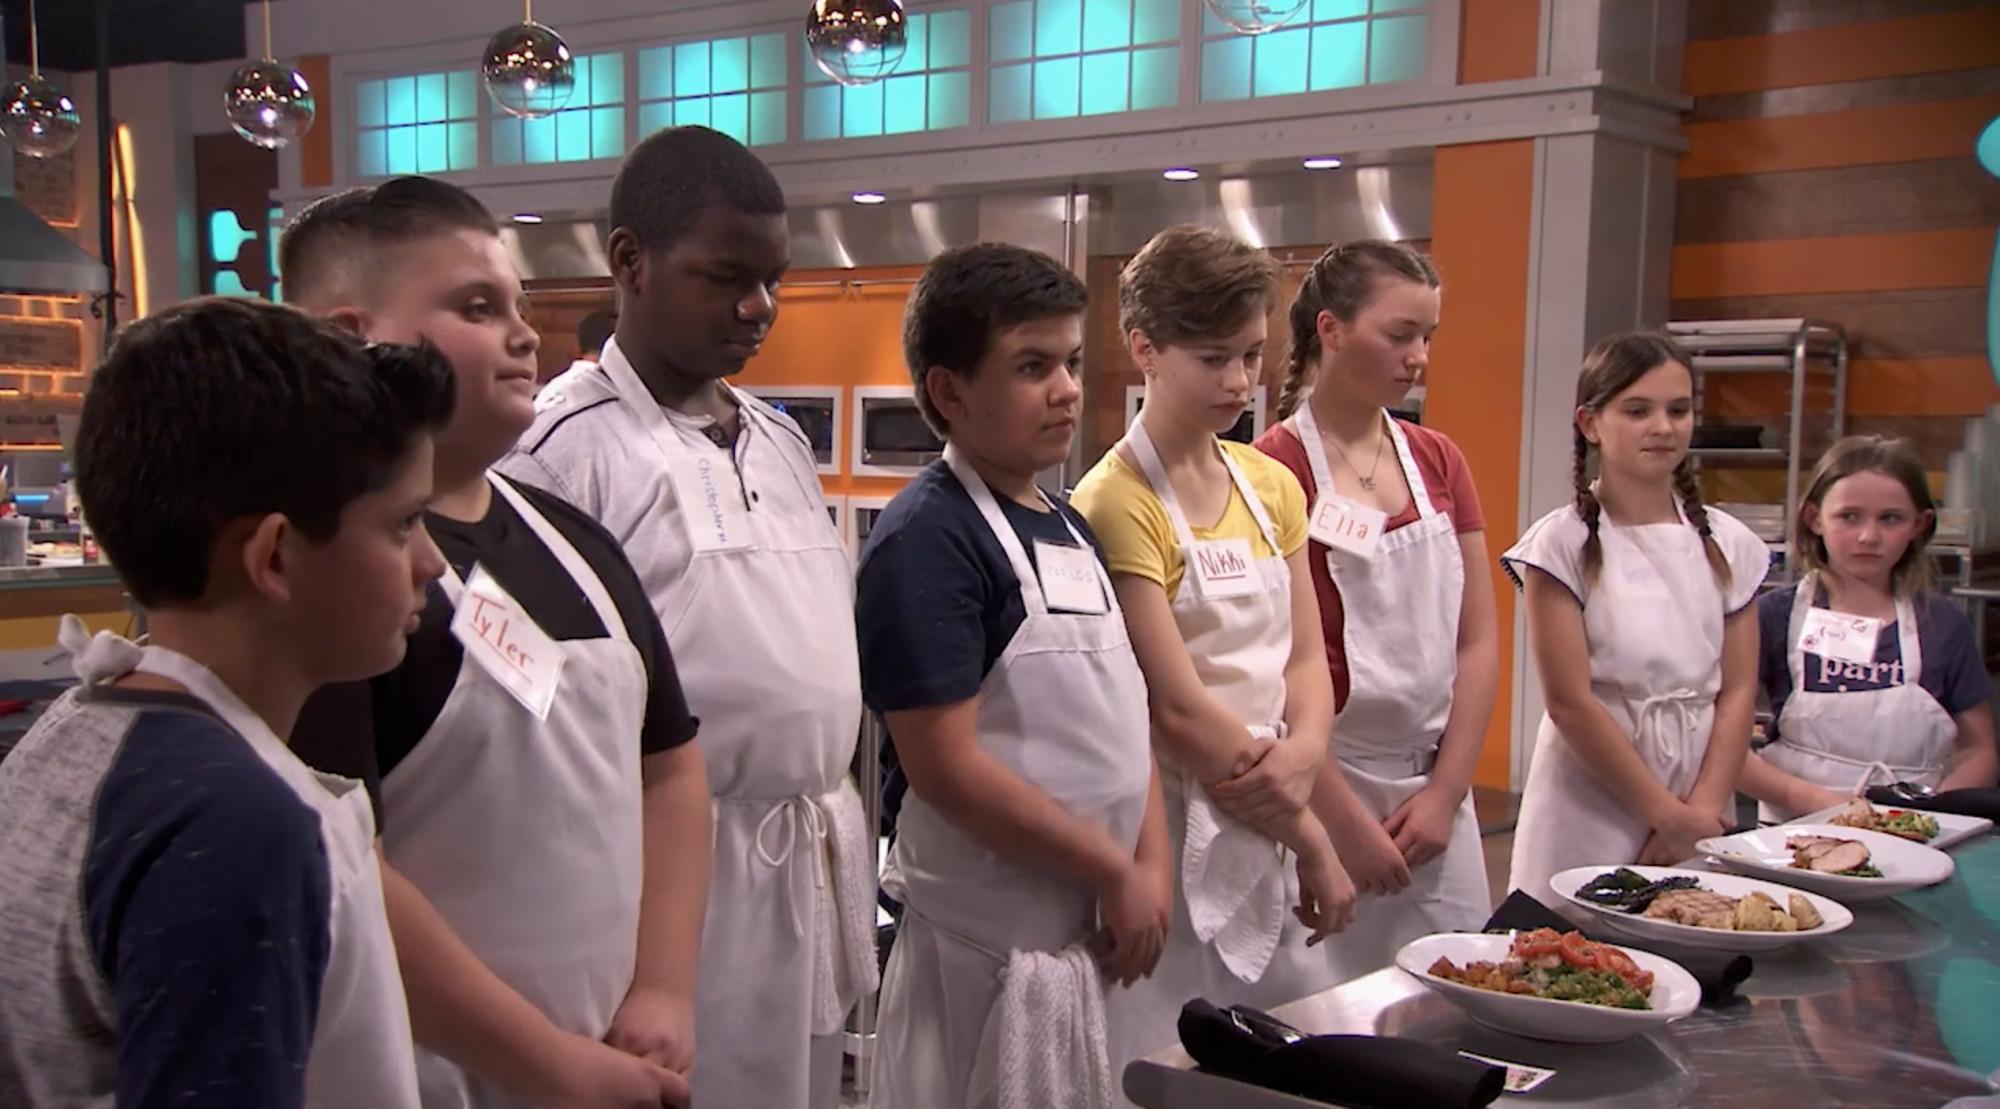 Top Chef Junior season 2 Making the Cut screen grab